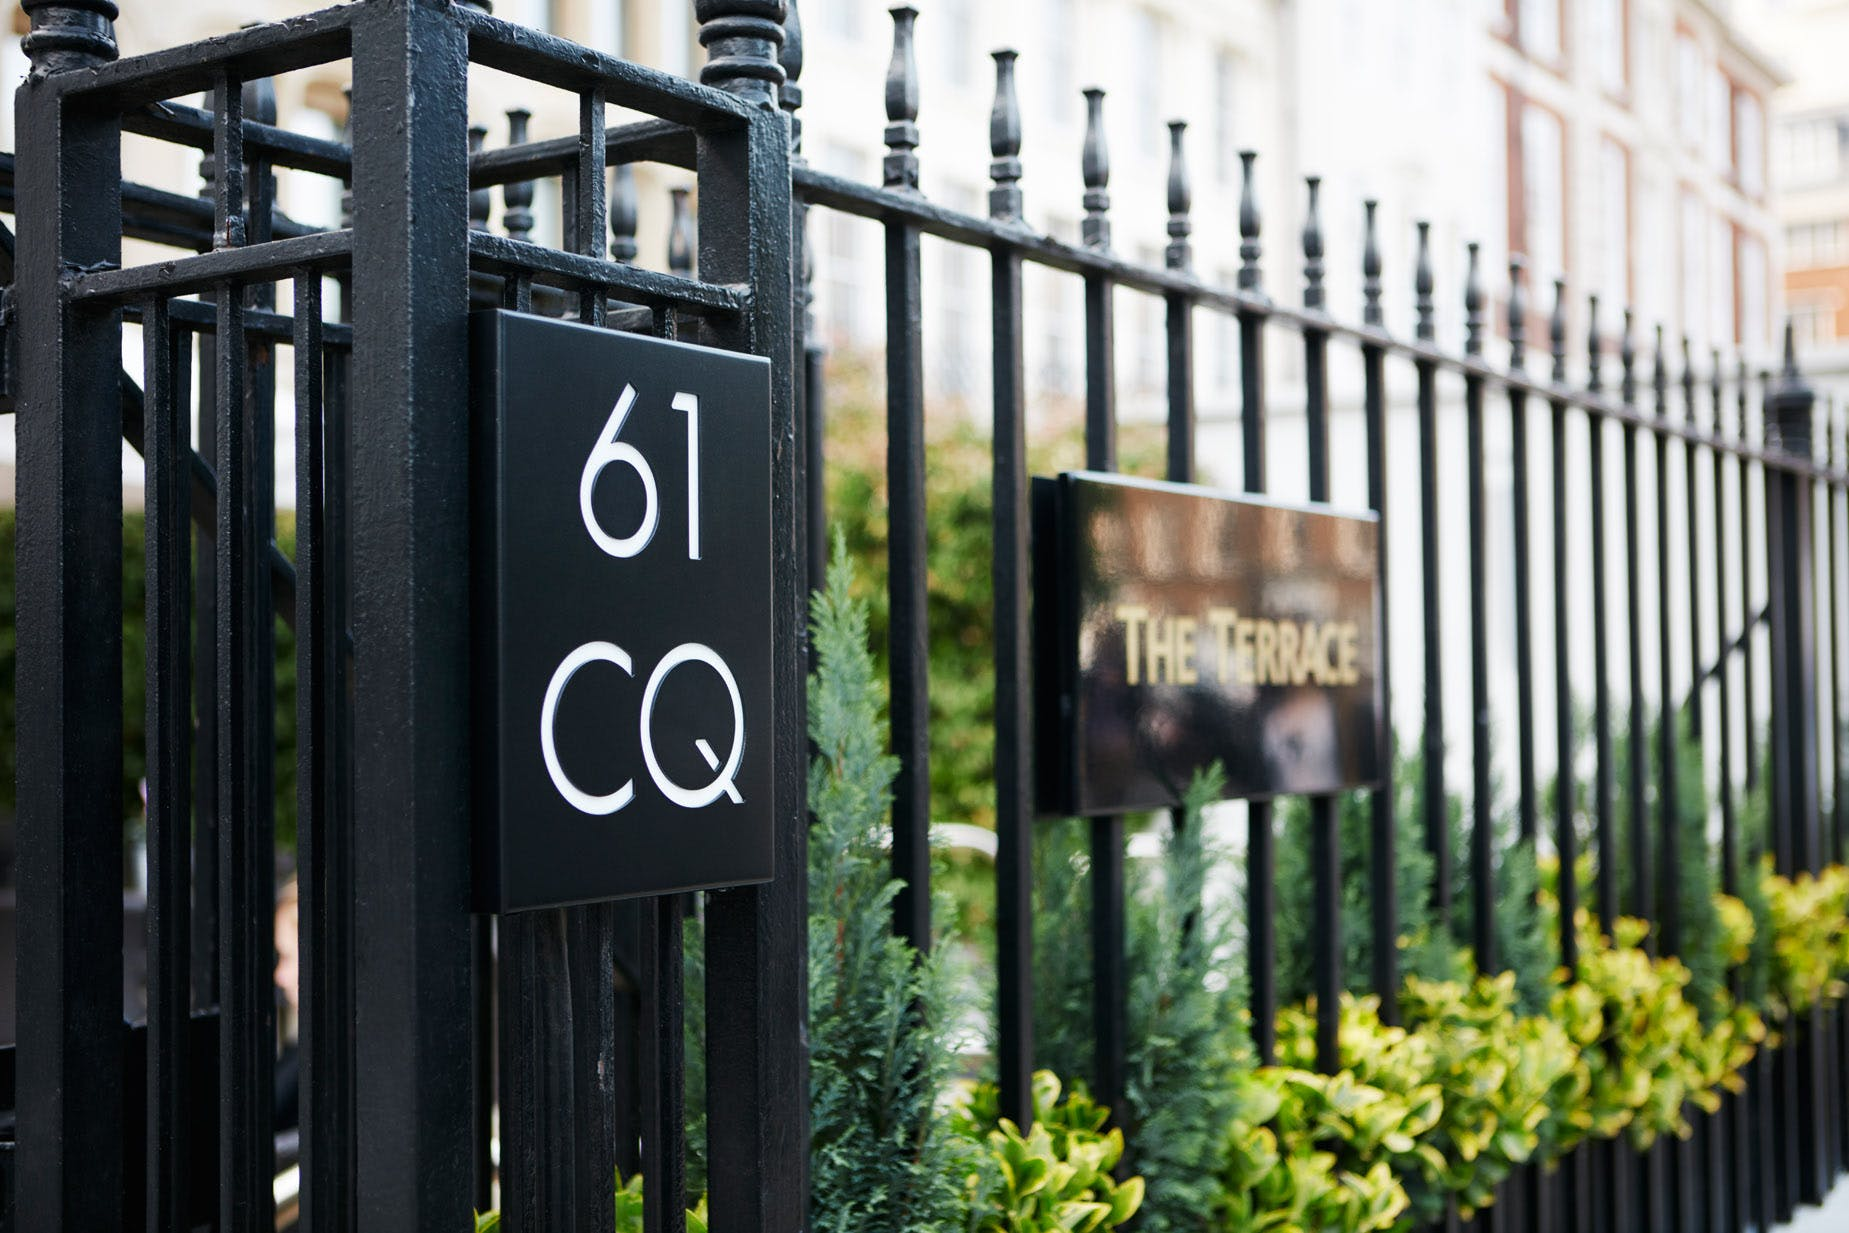 The Terrace at Club Quarters Hotel, Lincoln's Inn Field-Holborn, London